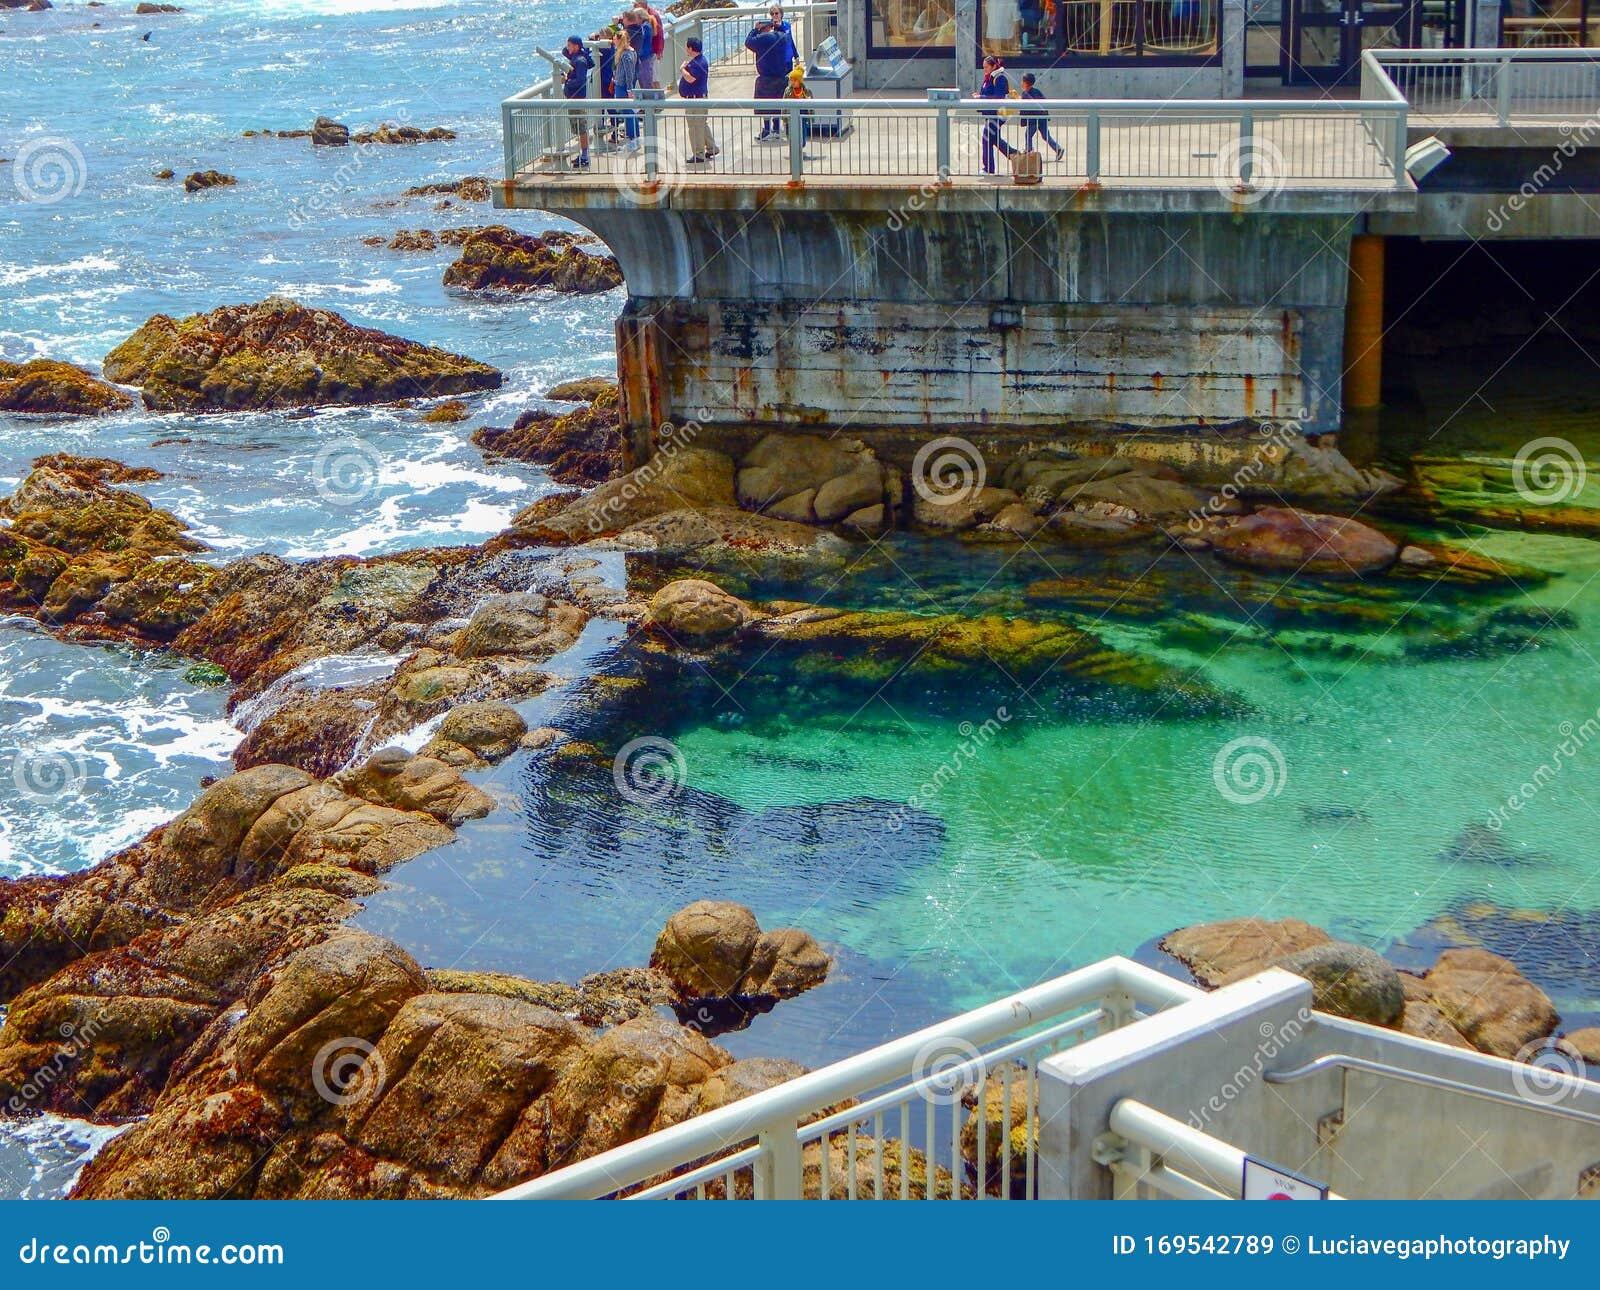 Monterey Bay Aquarium Outdoor View Editorial Stock Image ...